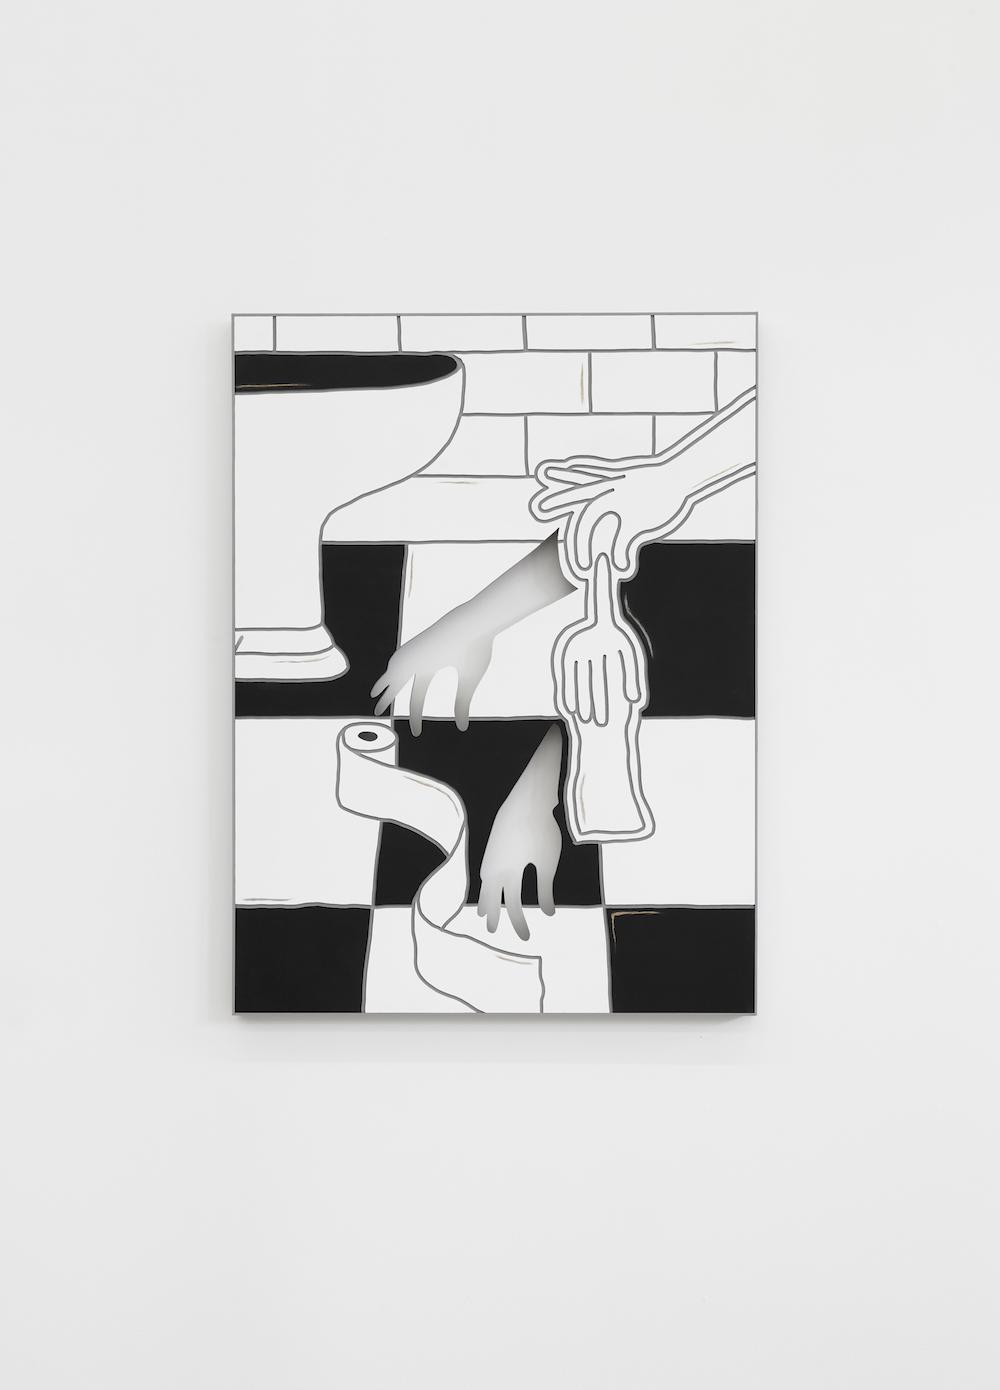 Milly Peck, Pressure Head 3, 2017. Emulsion on board. 112 x 83 x 5 cm.